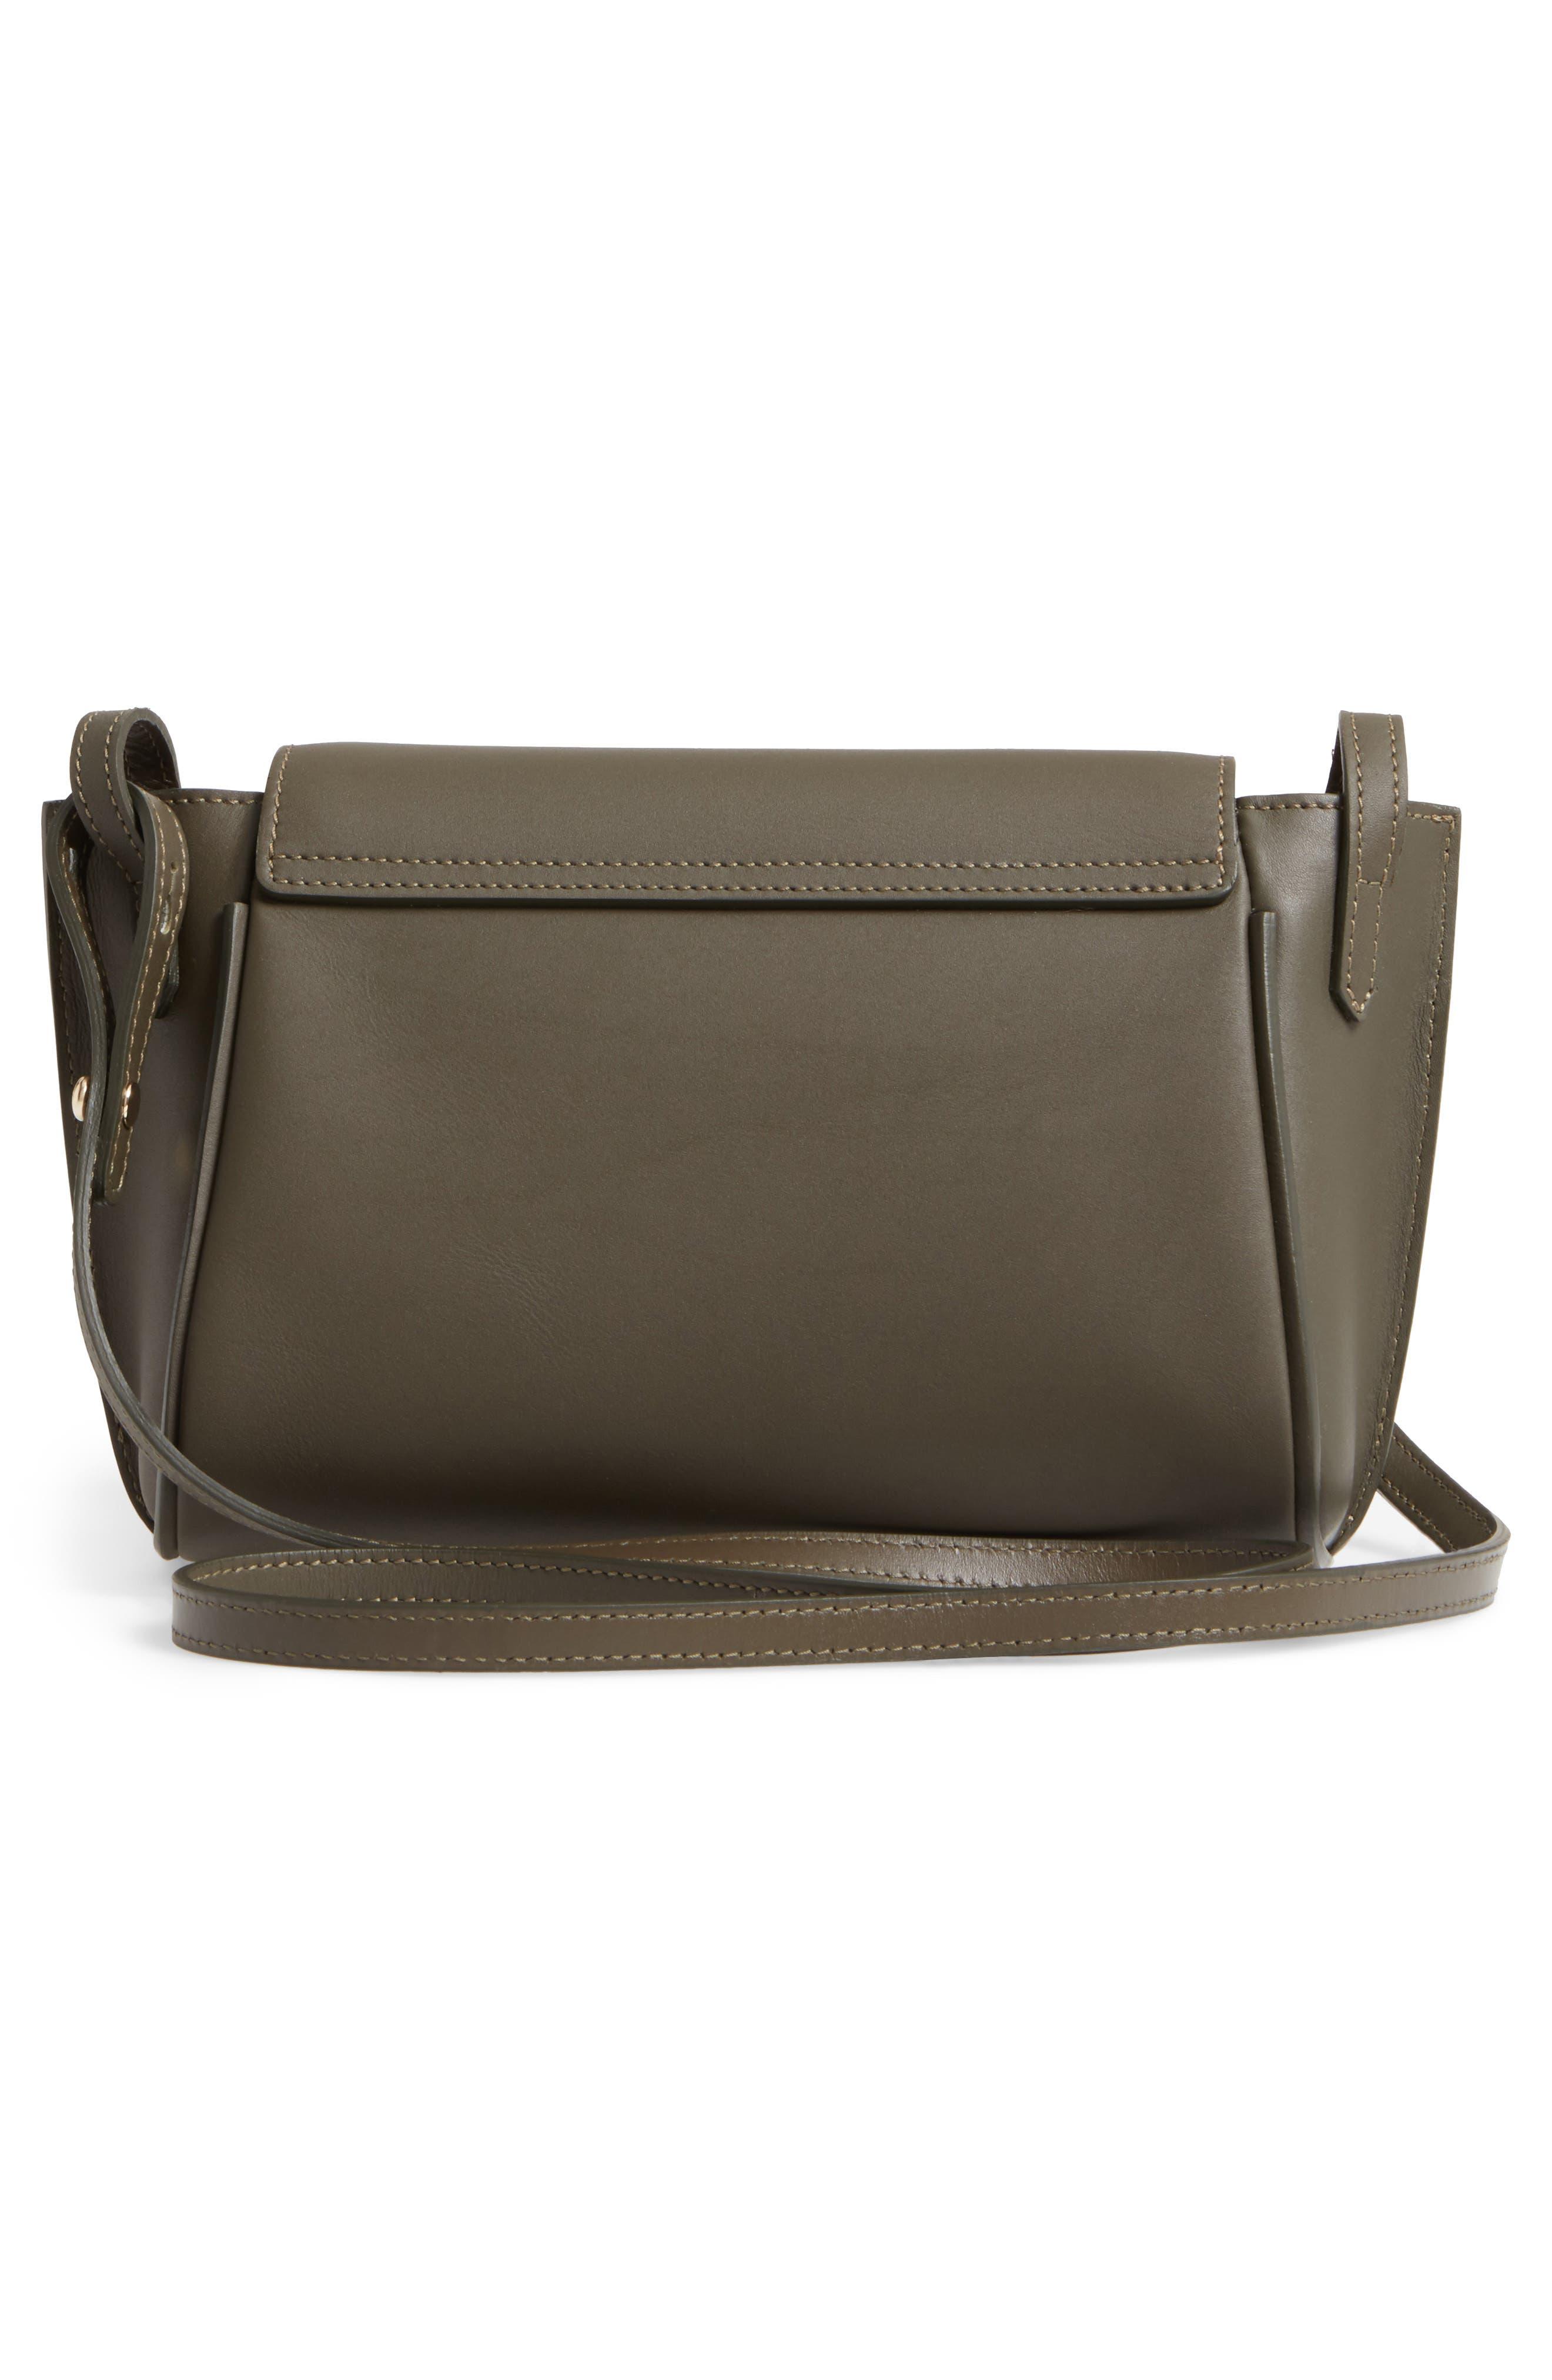 Small Penelope Leather Crossbody Bag,                             Alternate thumbnail 3, color,                             300